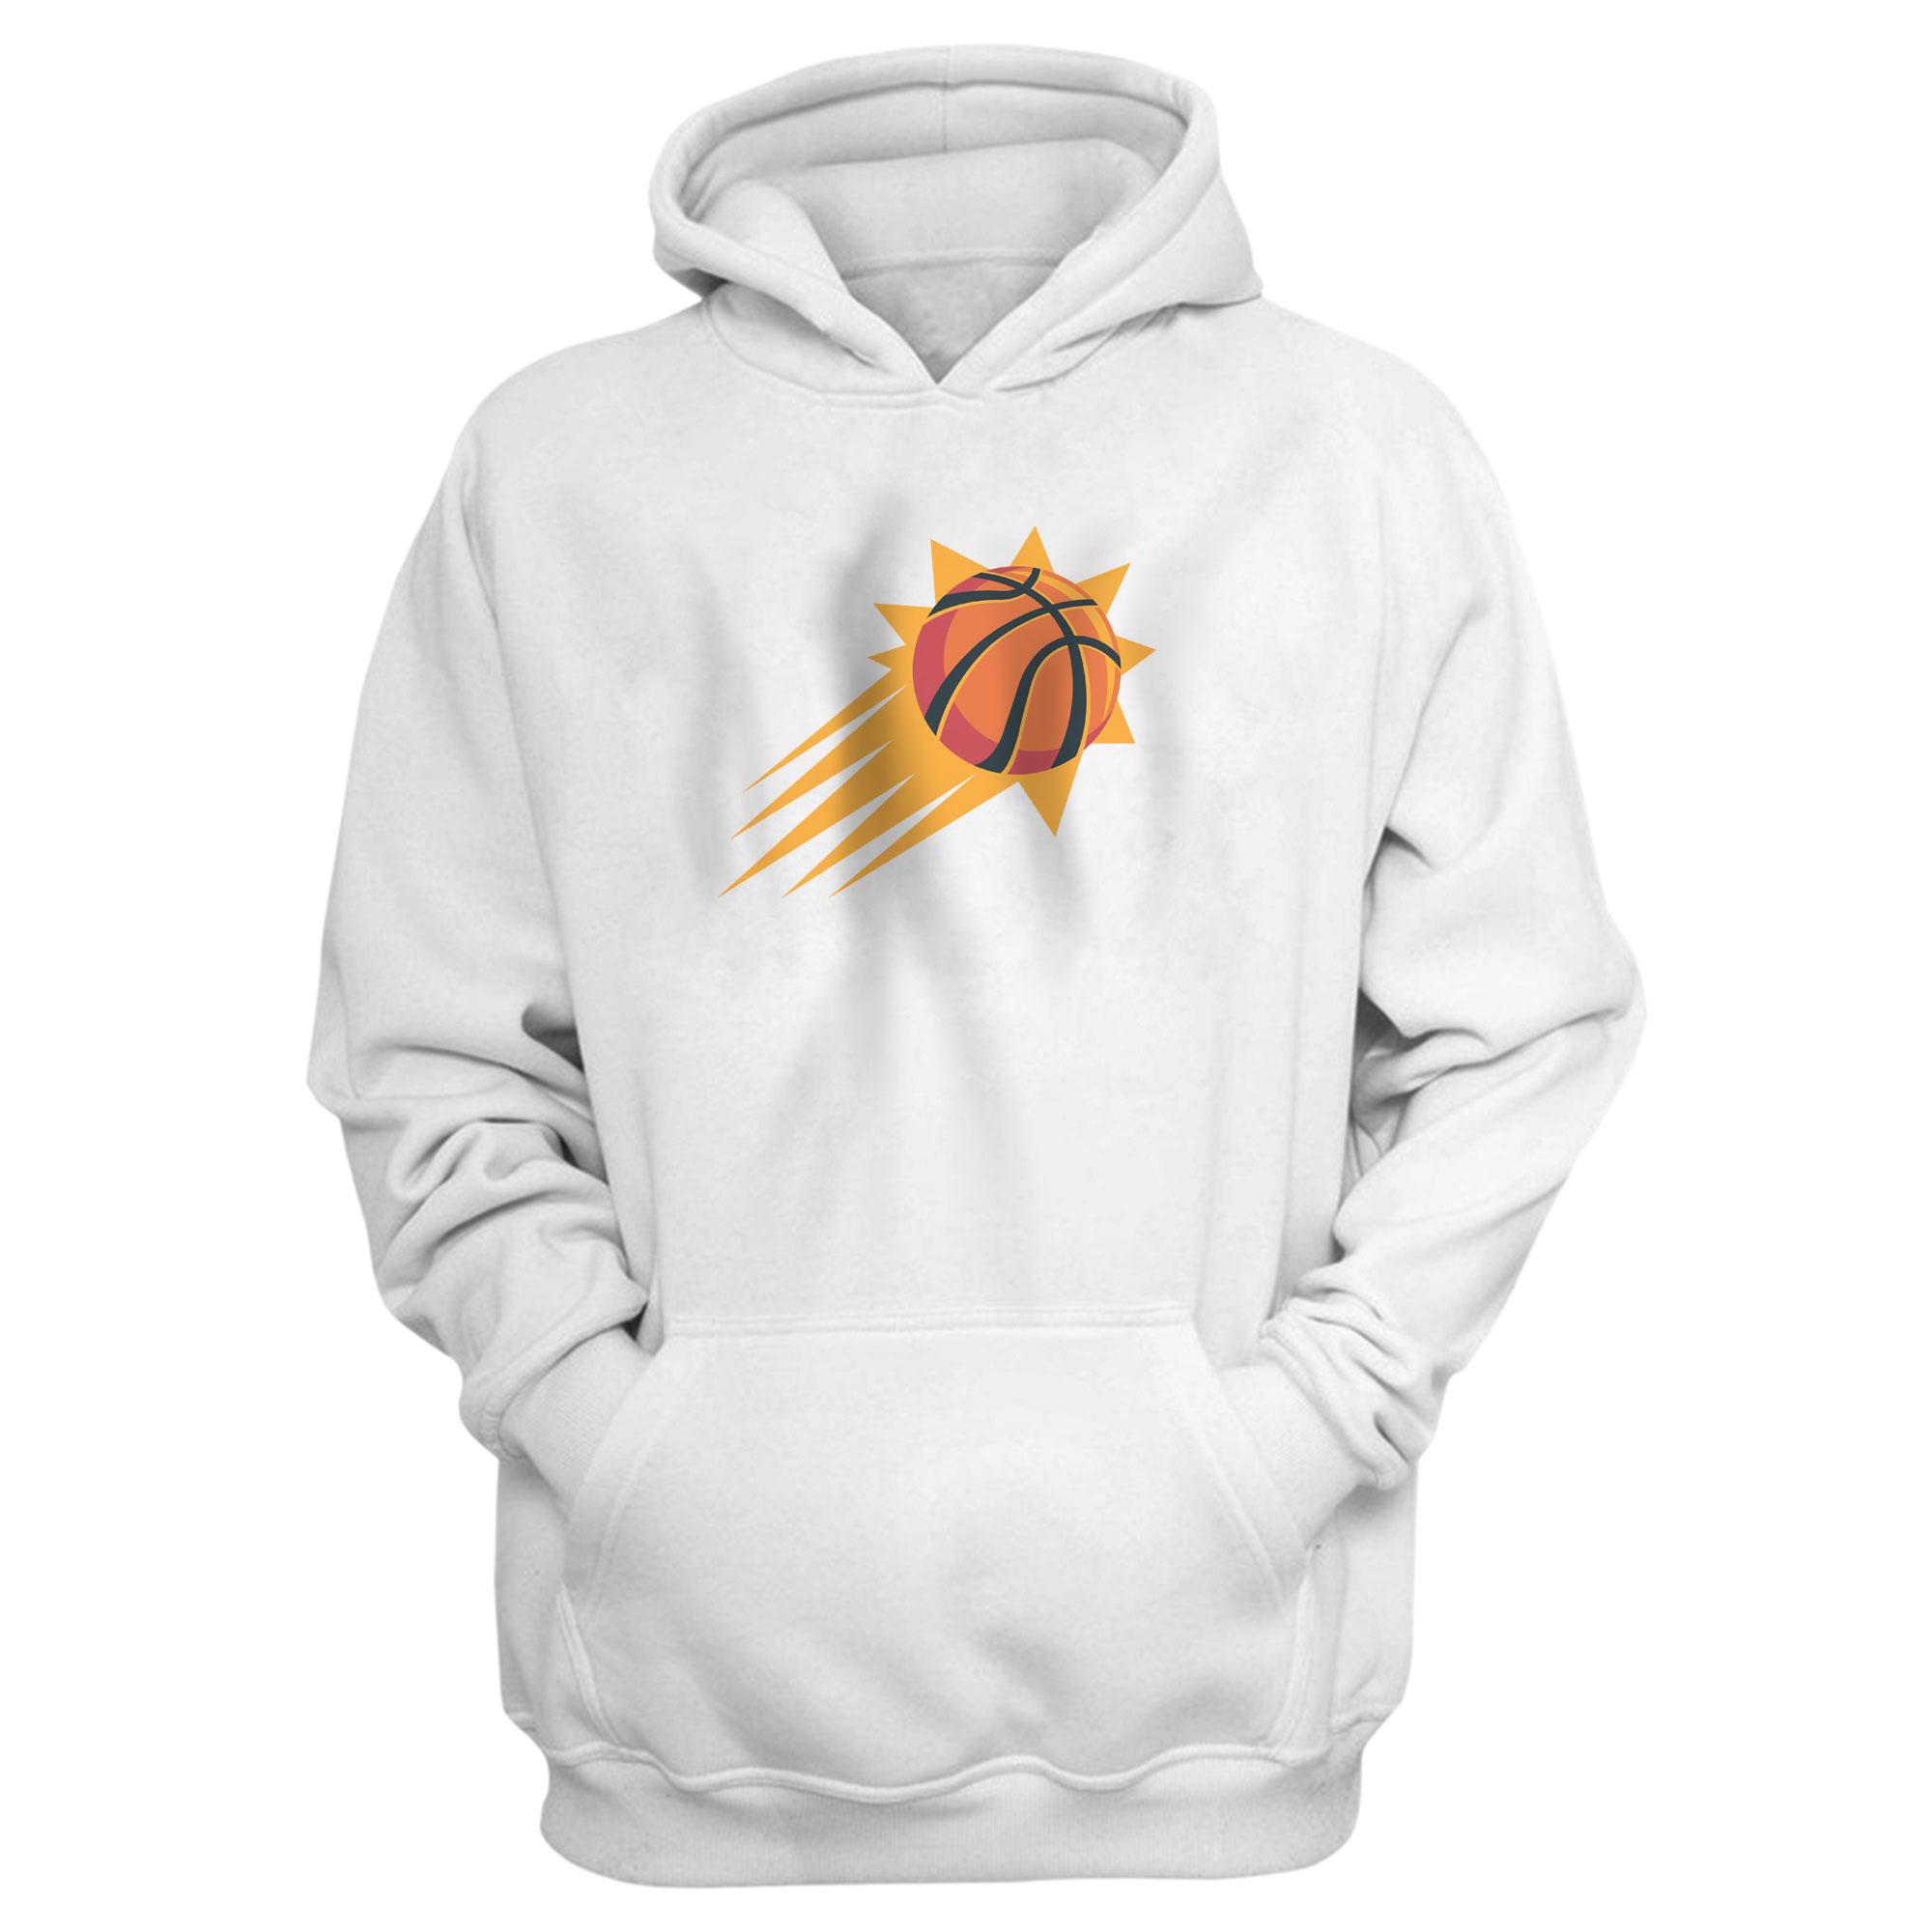 Phoenix Suns Hoodie (HD-WHT-NP-406-NBA-PHO-SUNS.NEW)